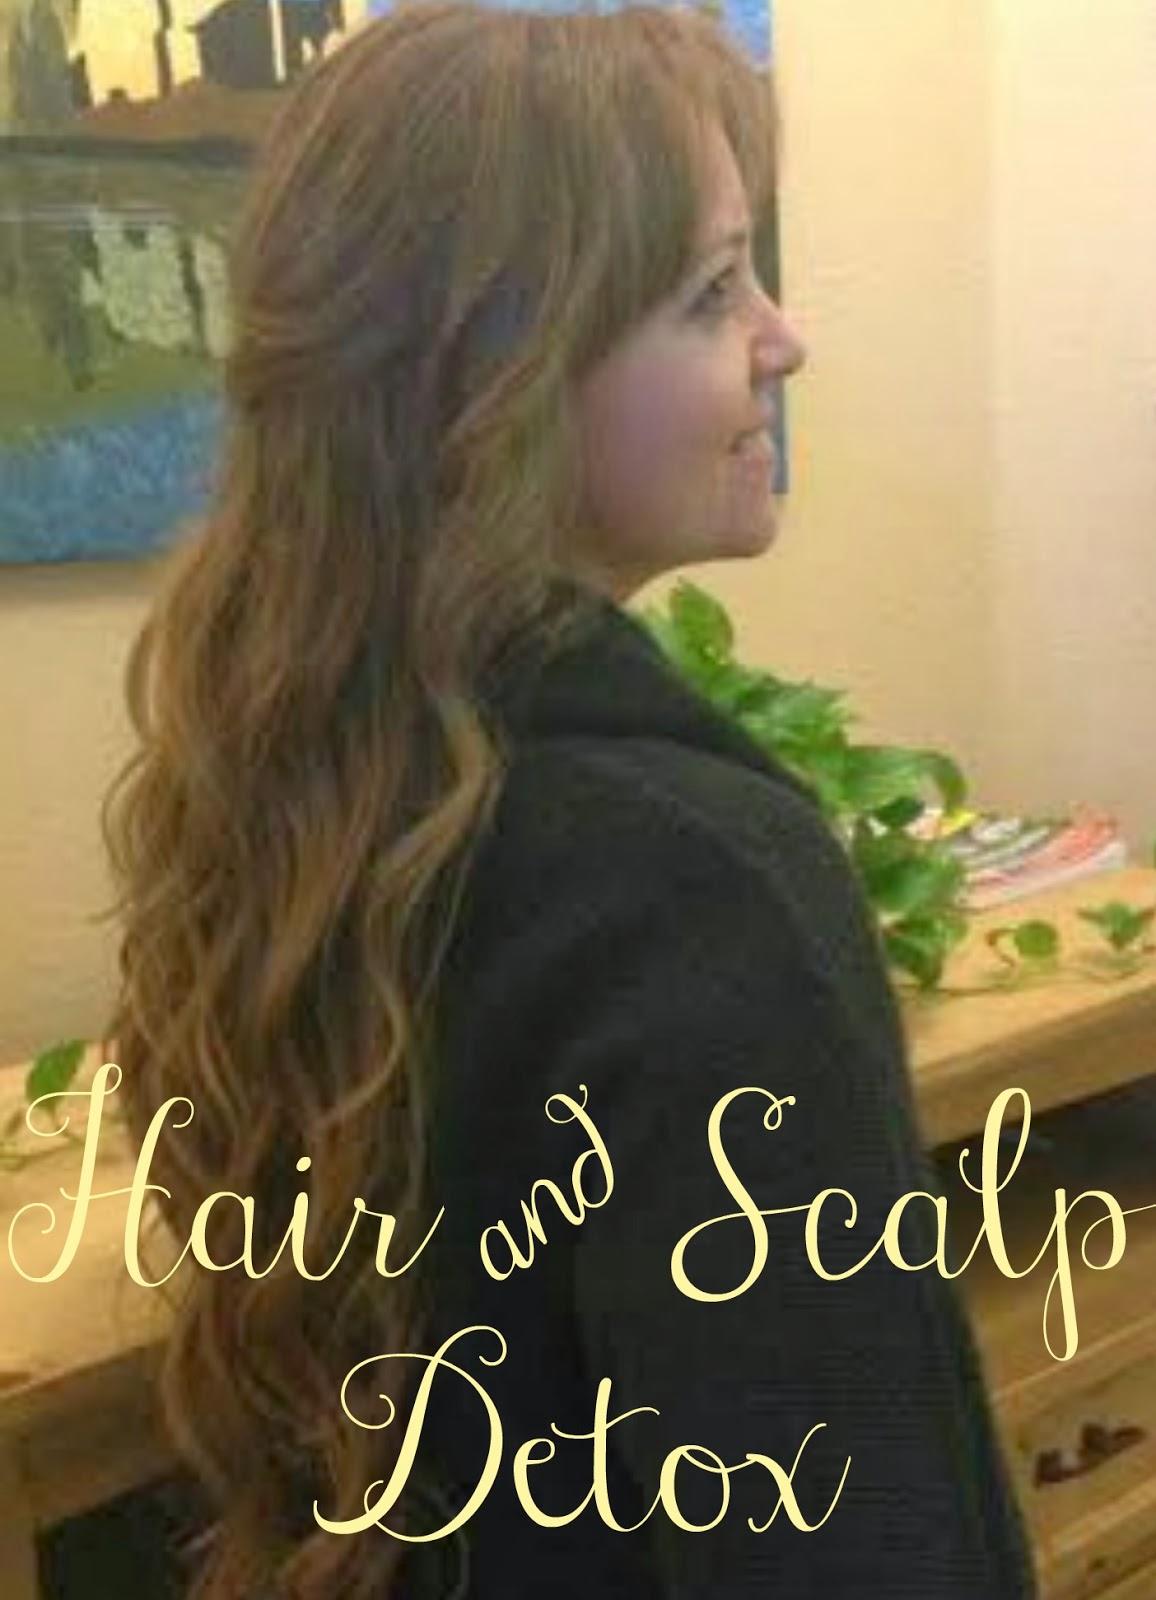 http://www.passionatepurelife.com/2014/01/hair-scalp-detox.html